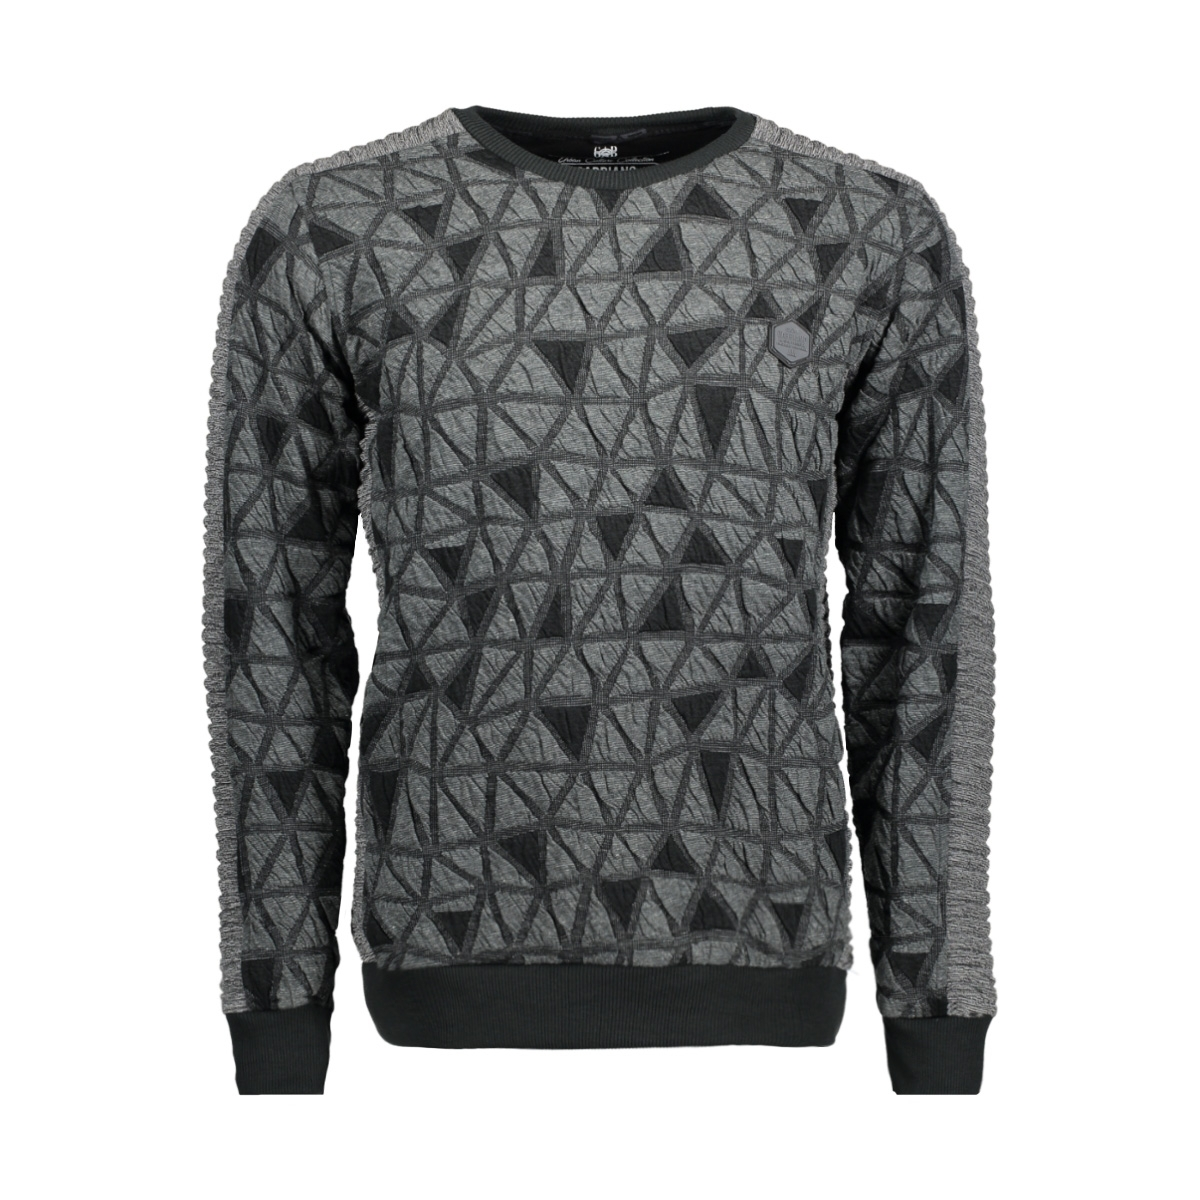 76148 gabbiano sweater black